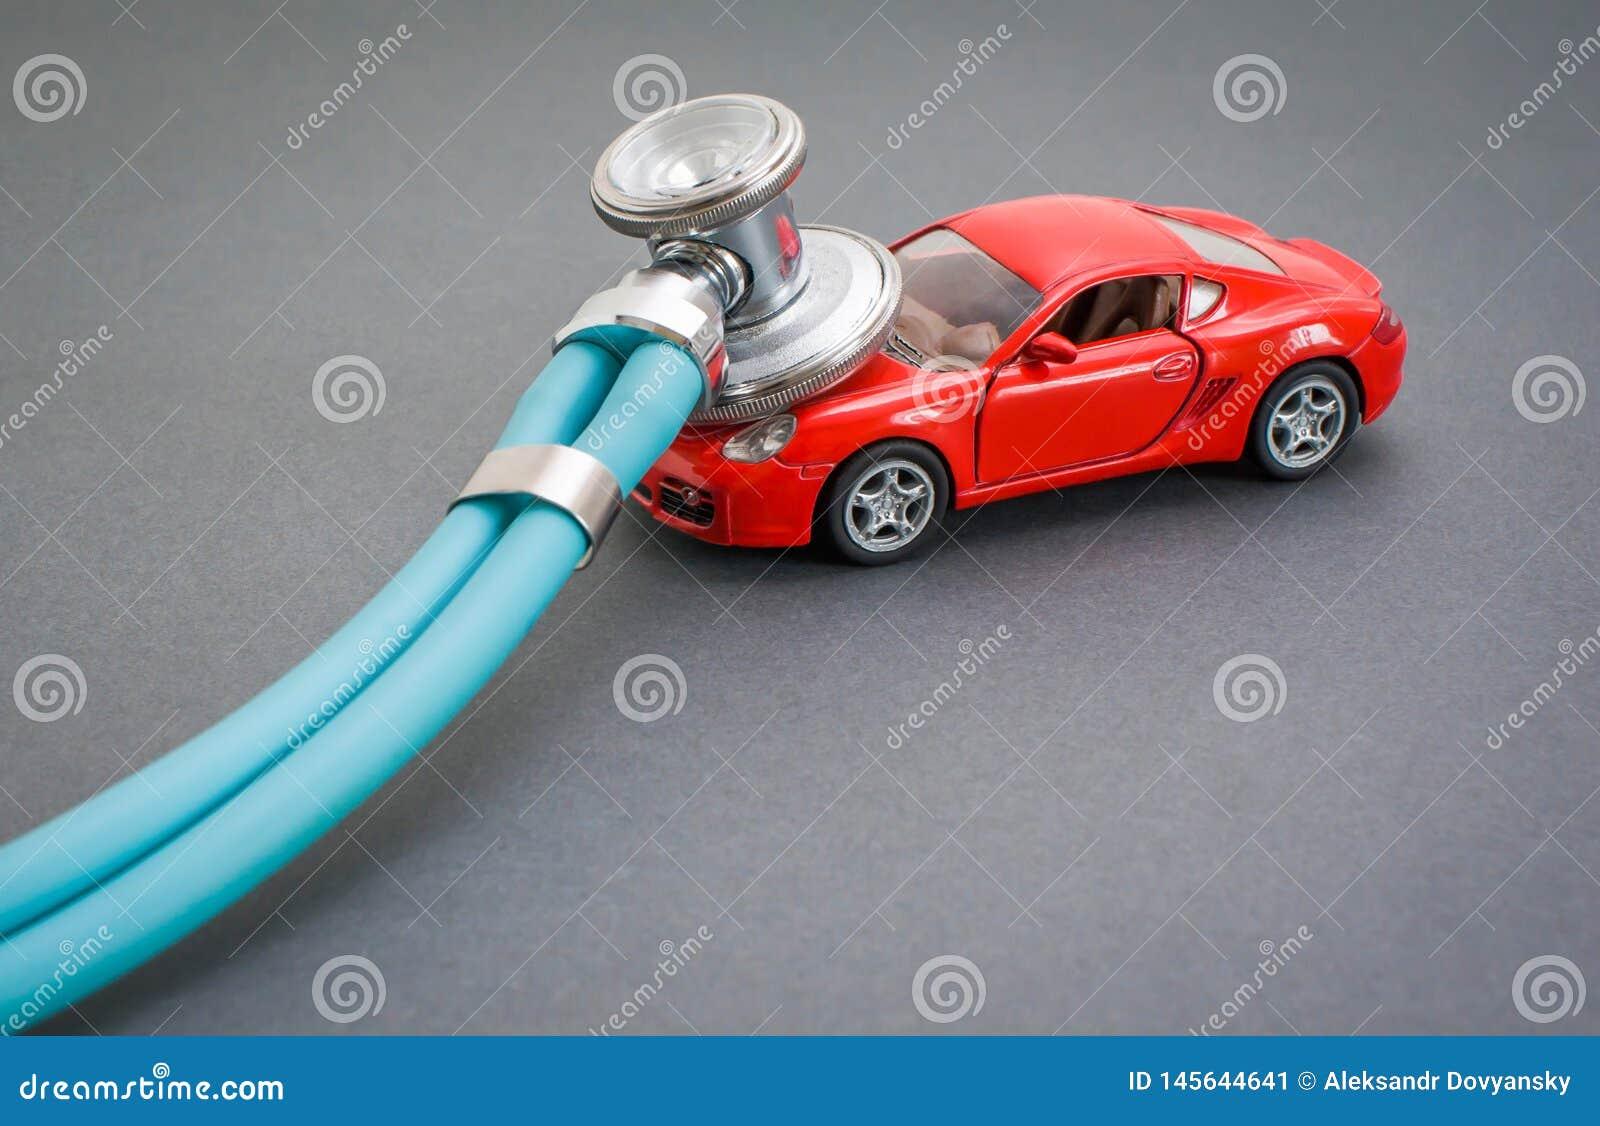 Car diagnostics, inspection, repair and maintenance